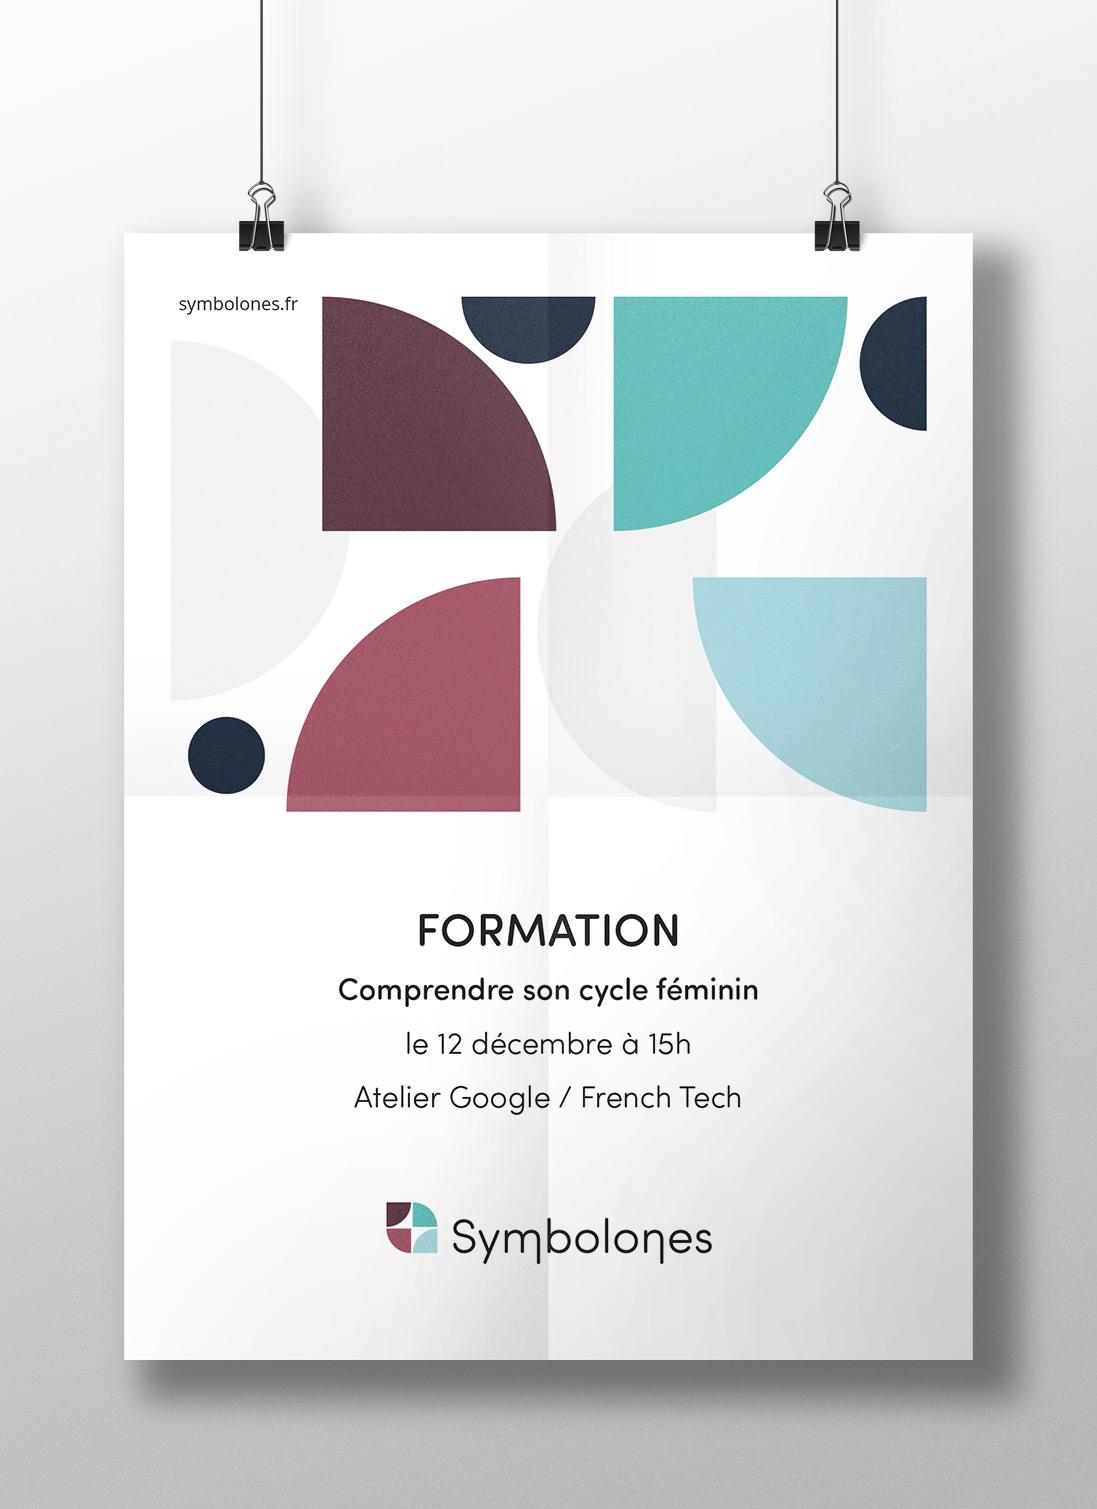 https://isse-ari-design.fr/wp-content/uploads/2020/08/poster-symbolones-1.jpg